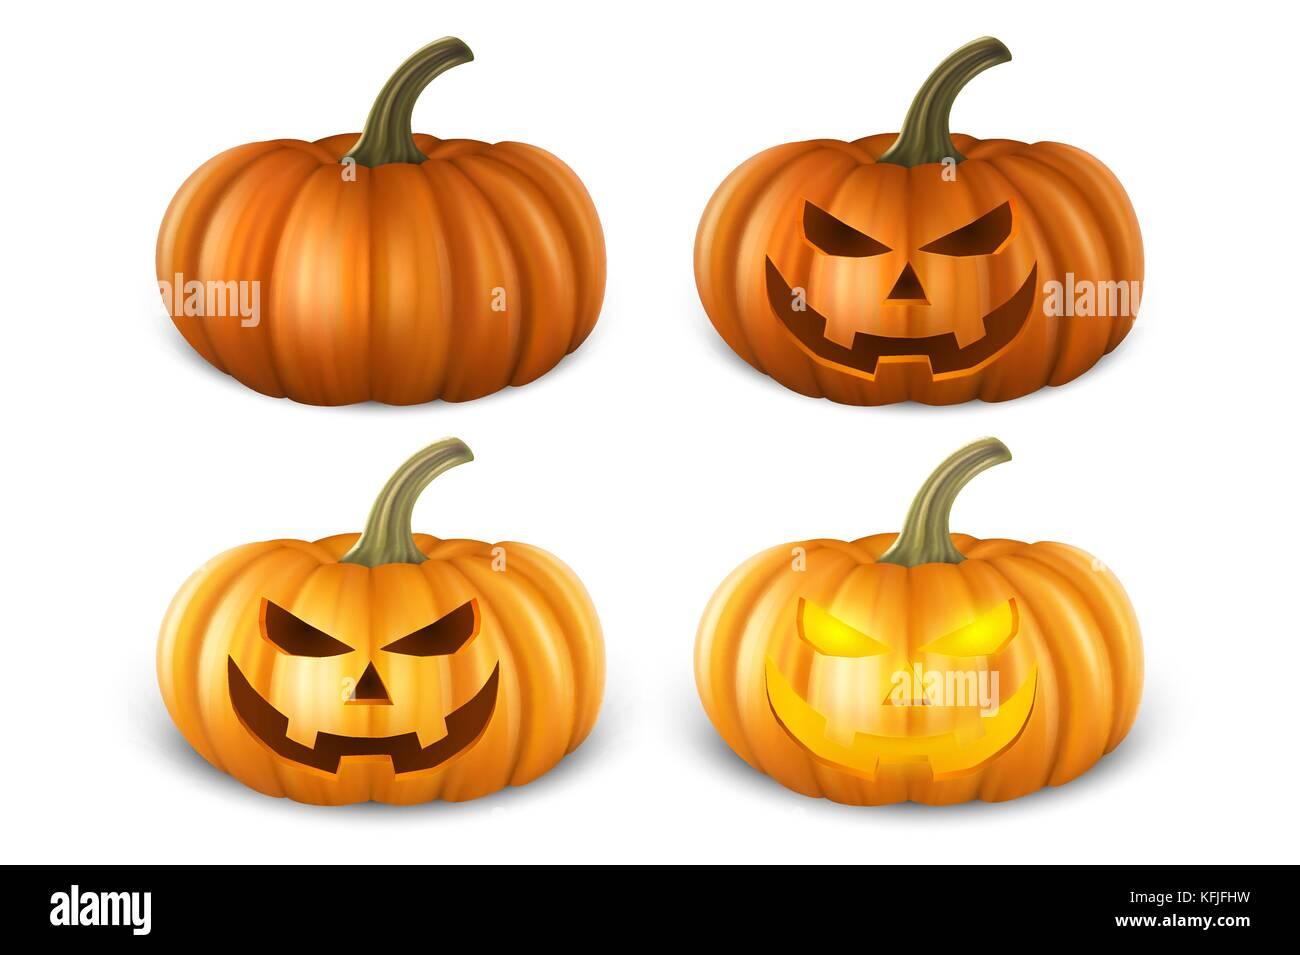 Realistic Pumpkin Set Head Jack Lantern Icon Closeup Isolated On